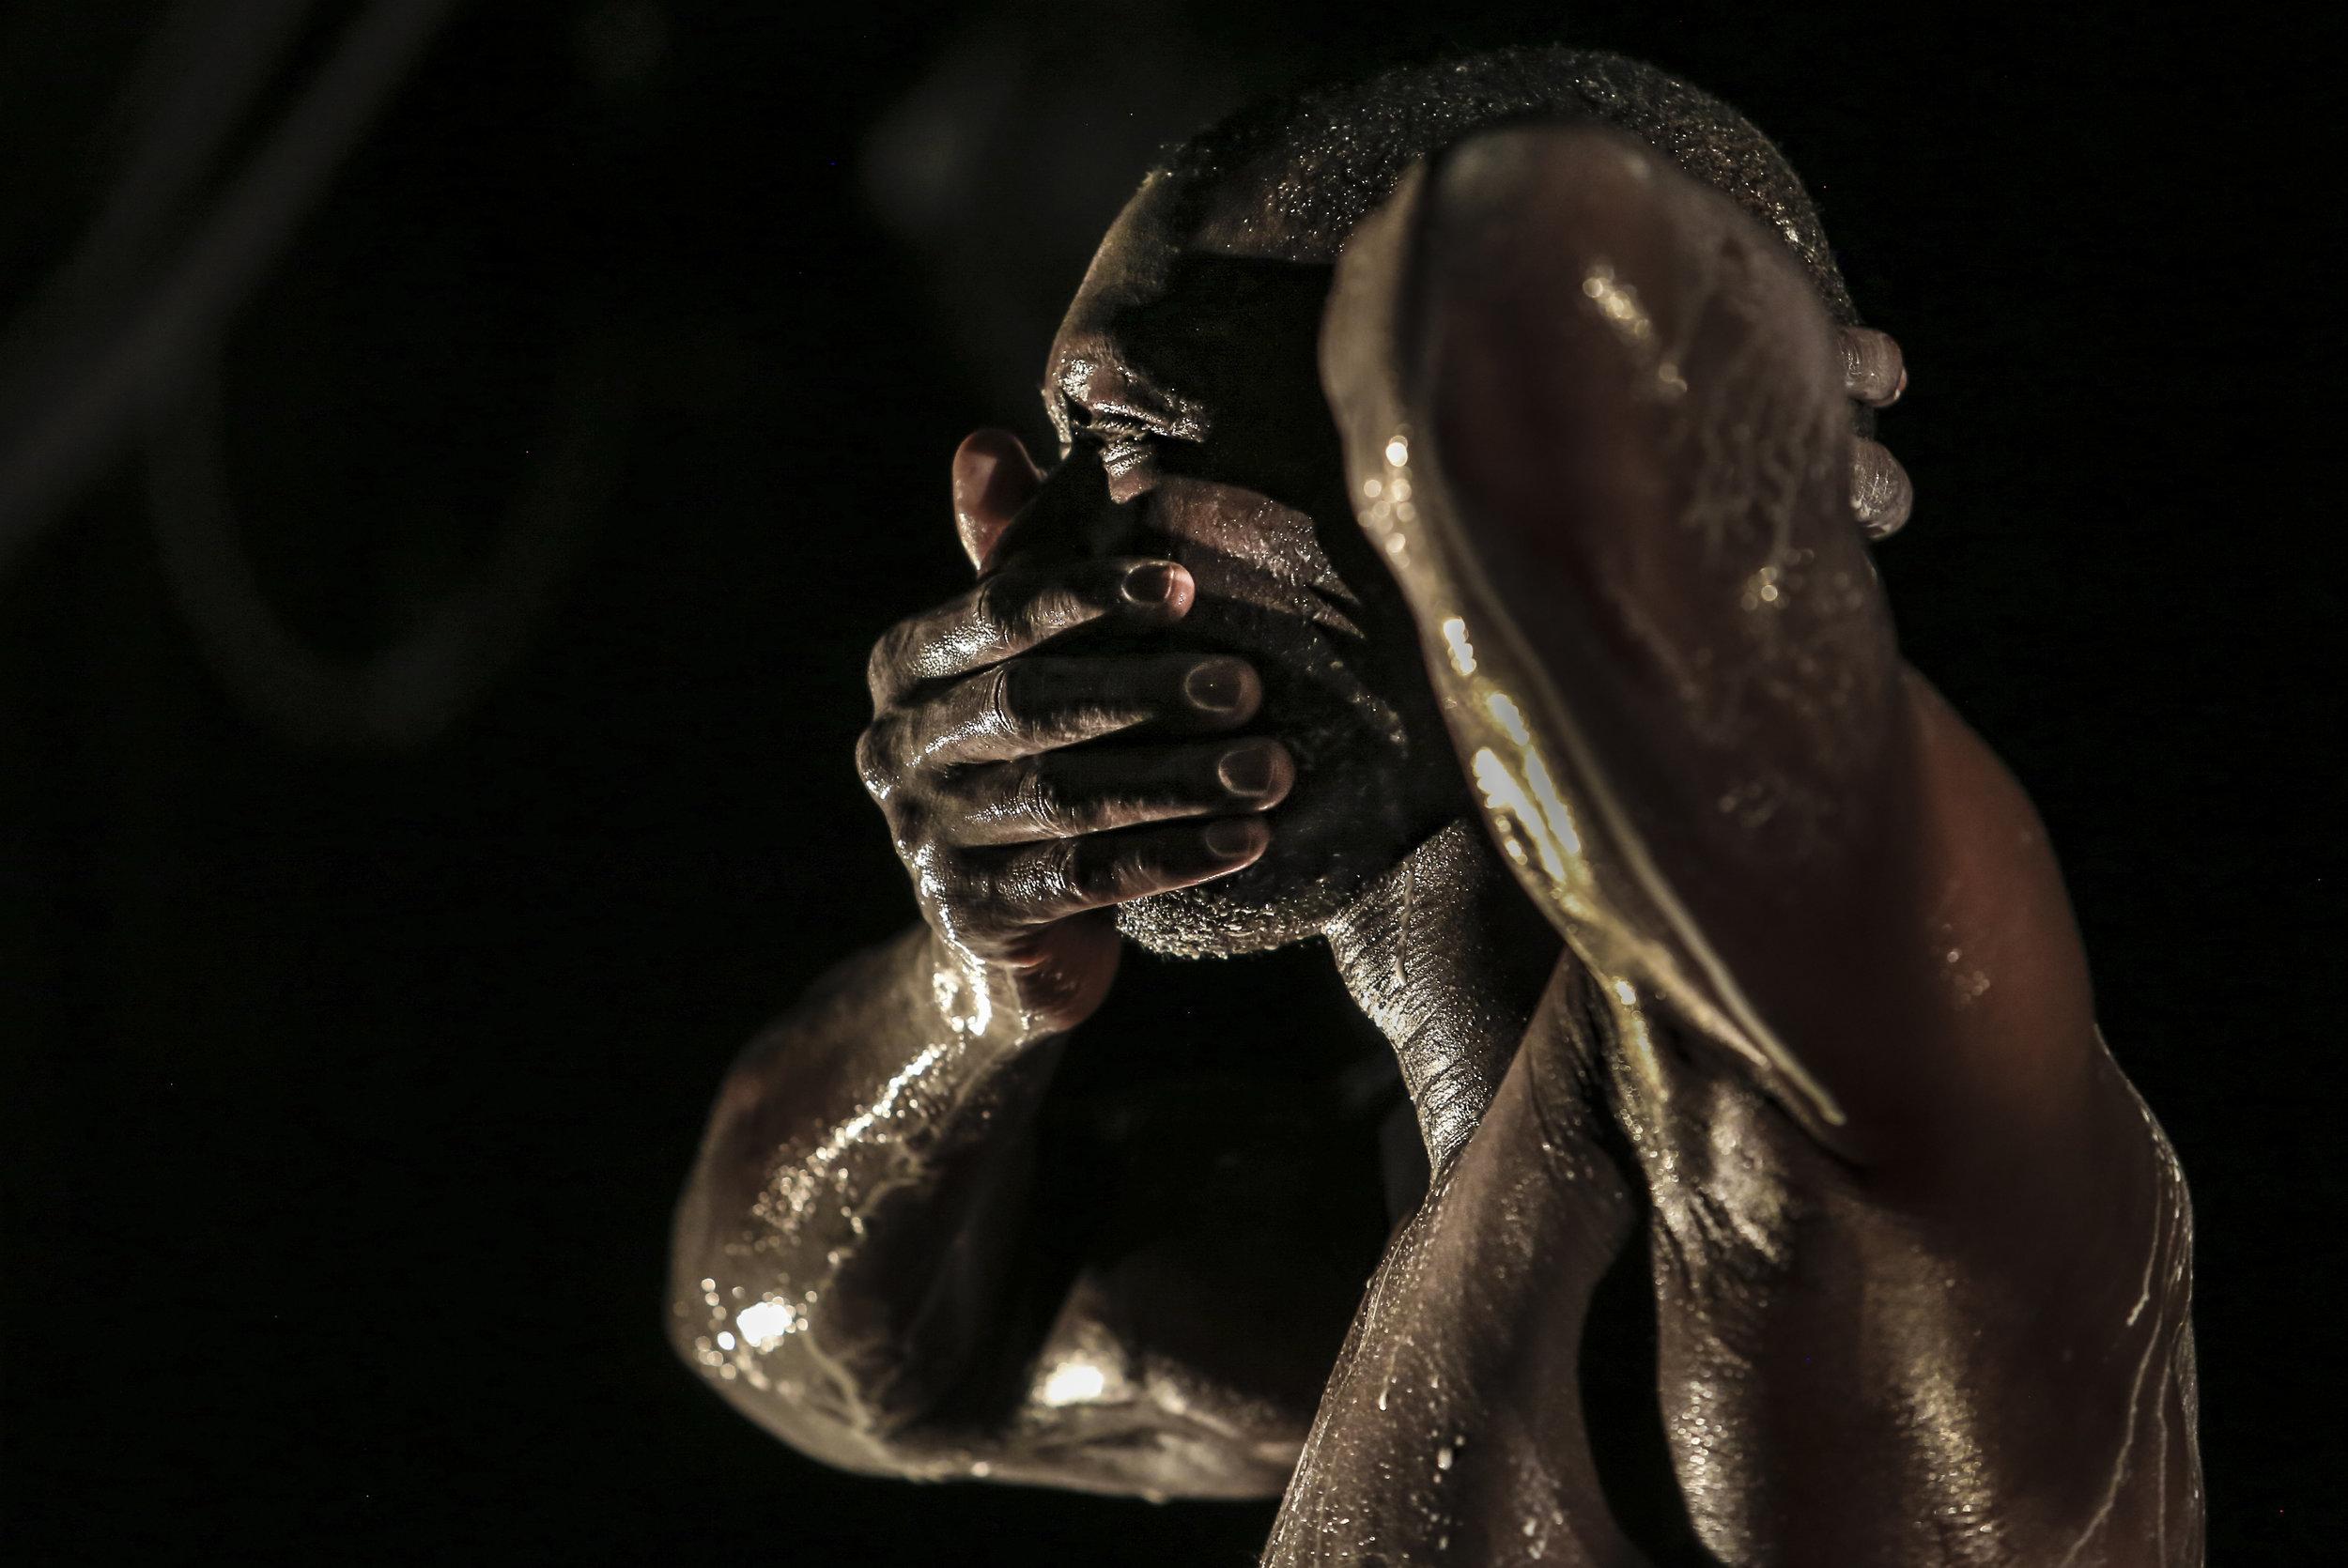 Entre [Deux] 2.0 - Abdou N'gom - Cie Stylistik